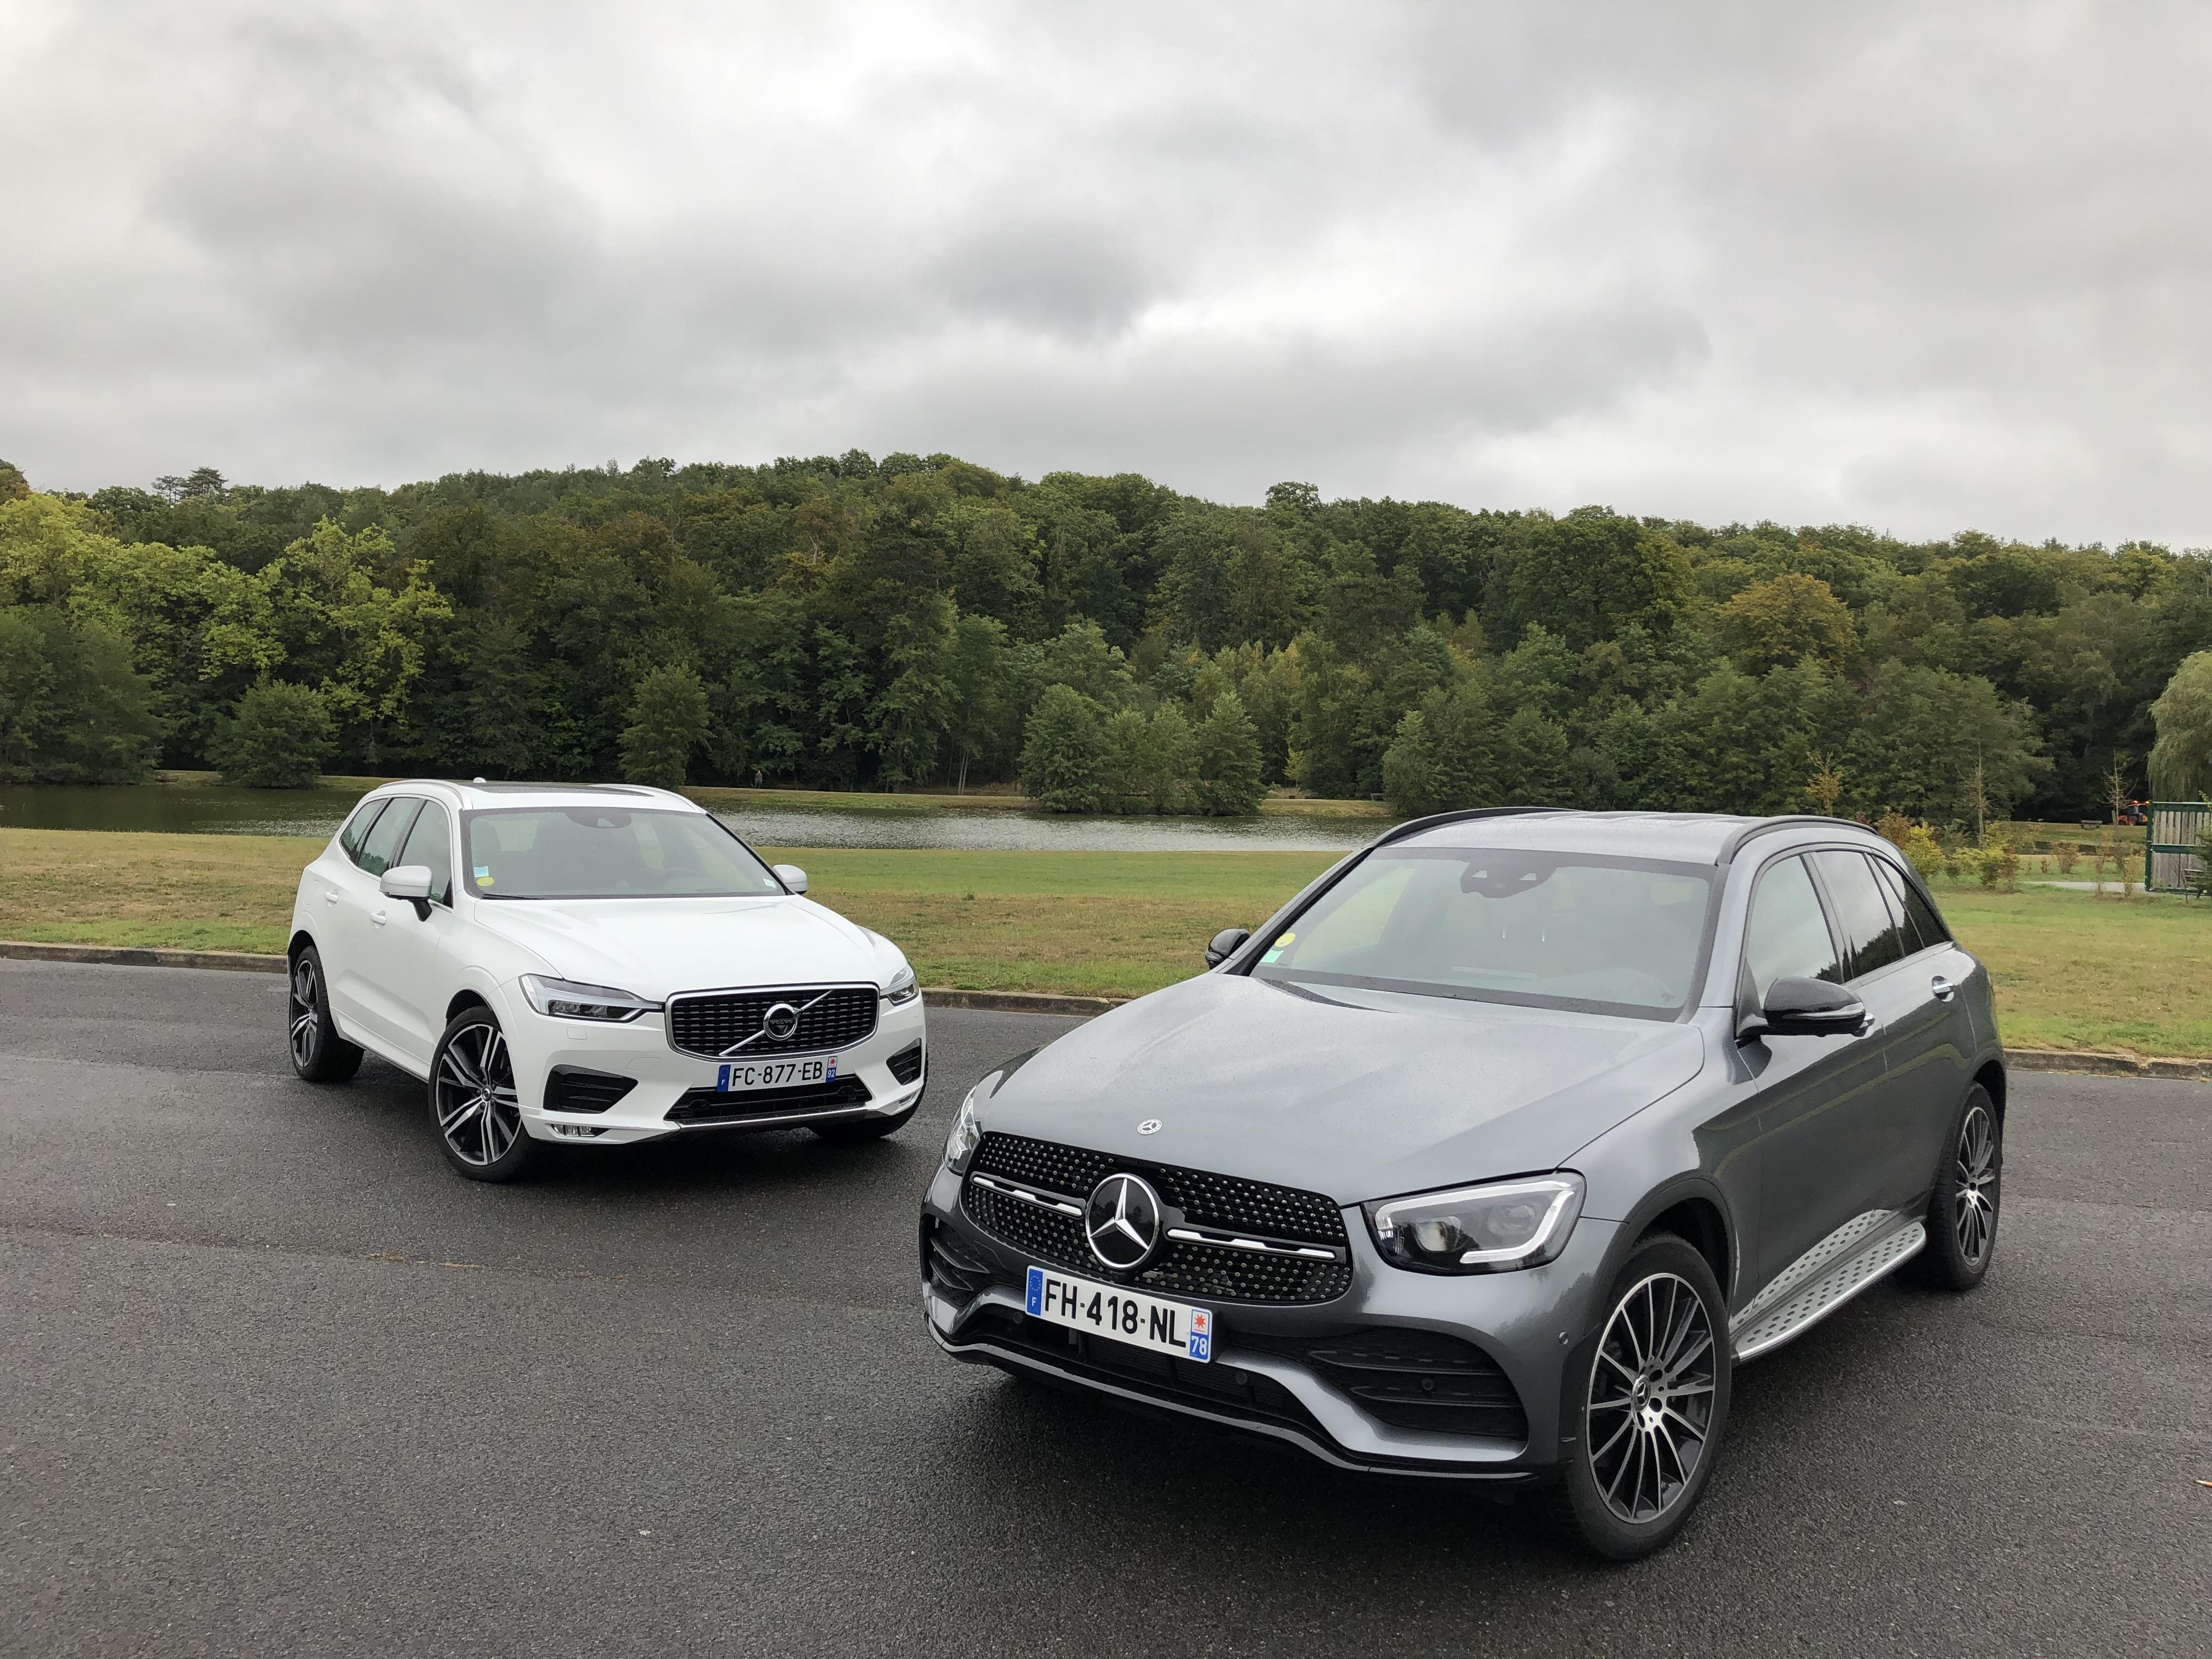 Comparatif - Mercedes GLC vs Volvo XC60